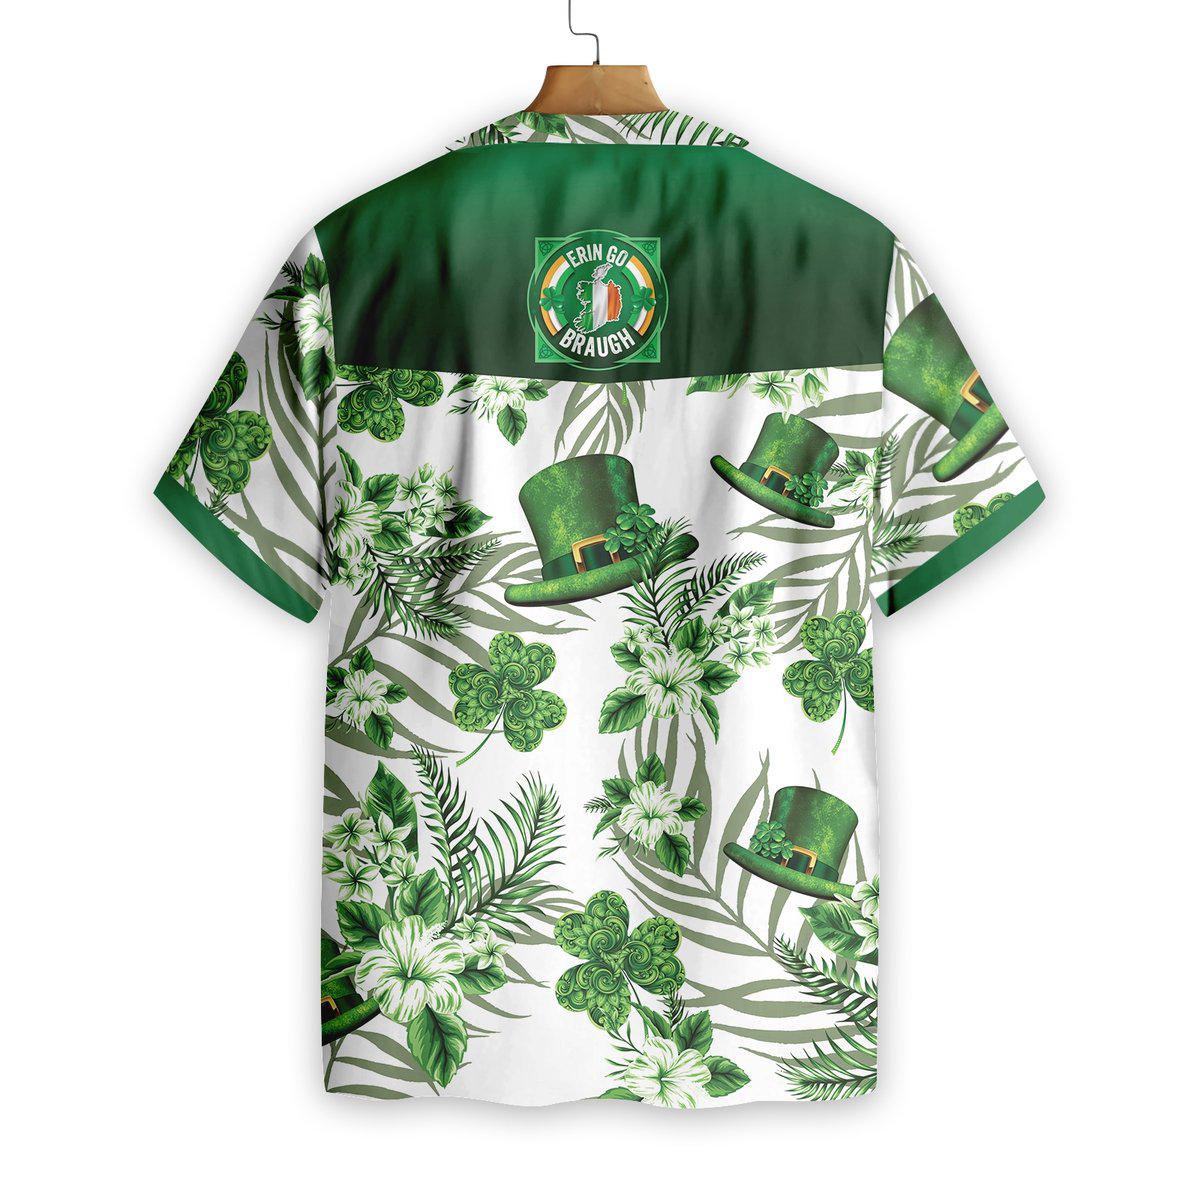 Erin Go Braugh Ireland Green Hat and Shamrock Pattern Hawaiian Shirt1